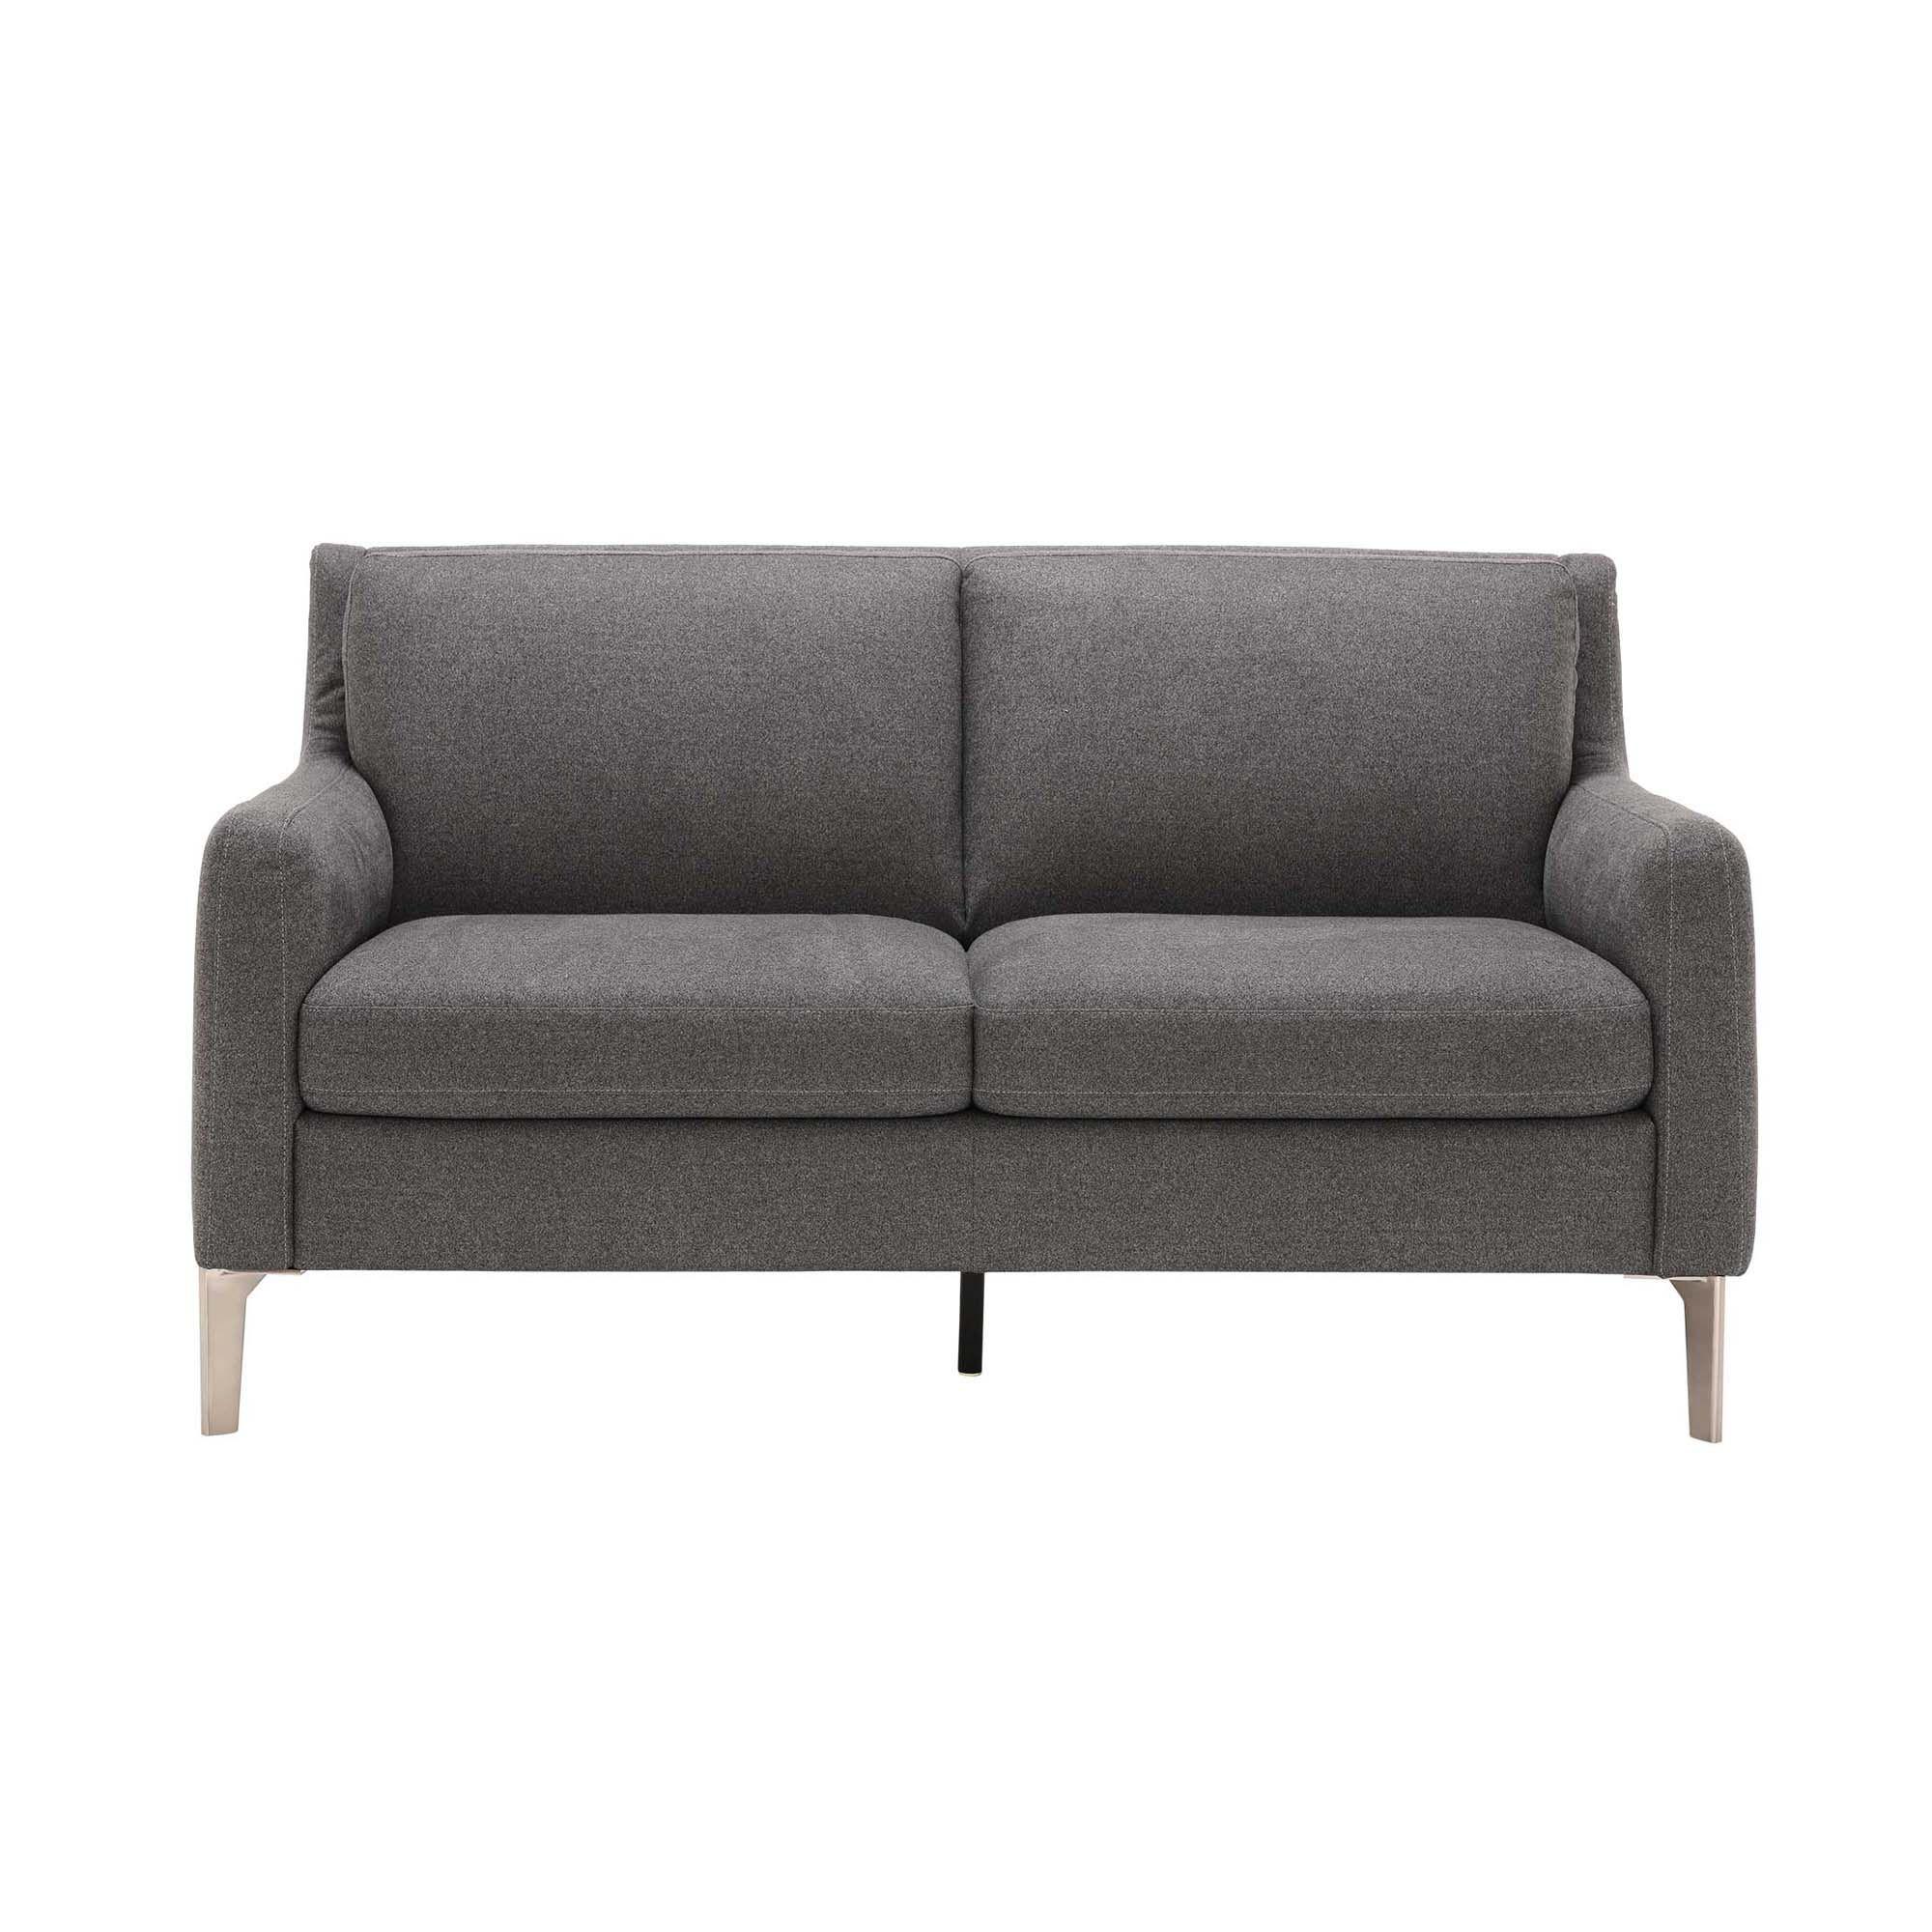 Cabrini Loveseat, Grey Fabric sofa, Modern sofa, Love seat